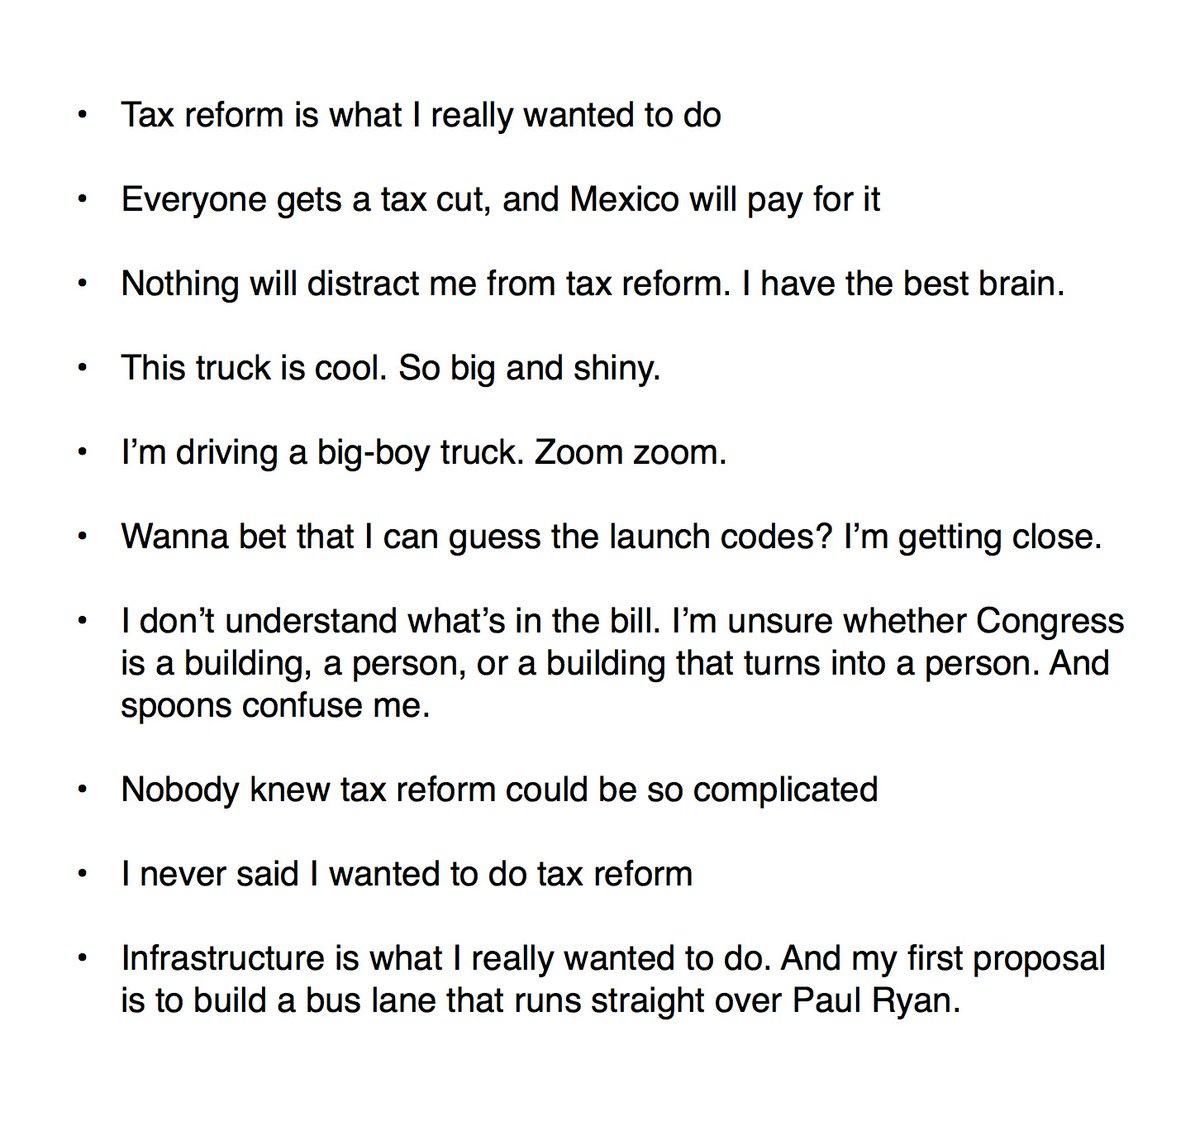 Timeline Of Tax Reform